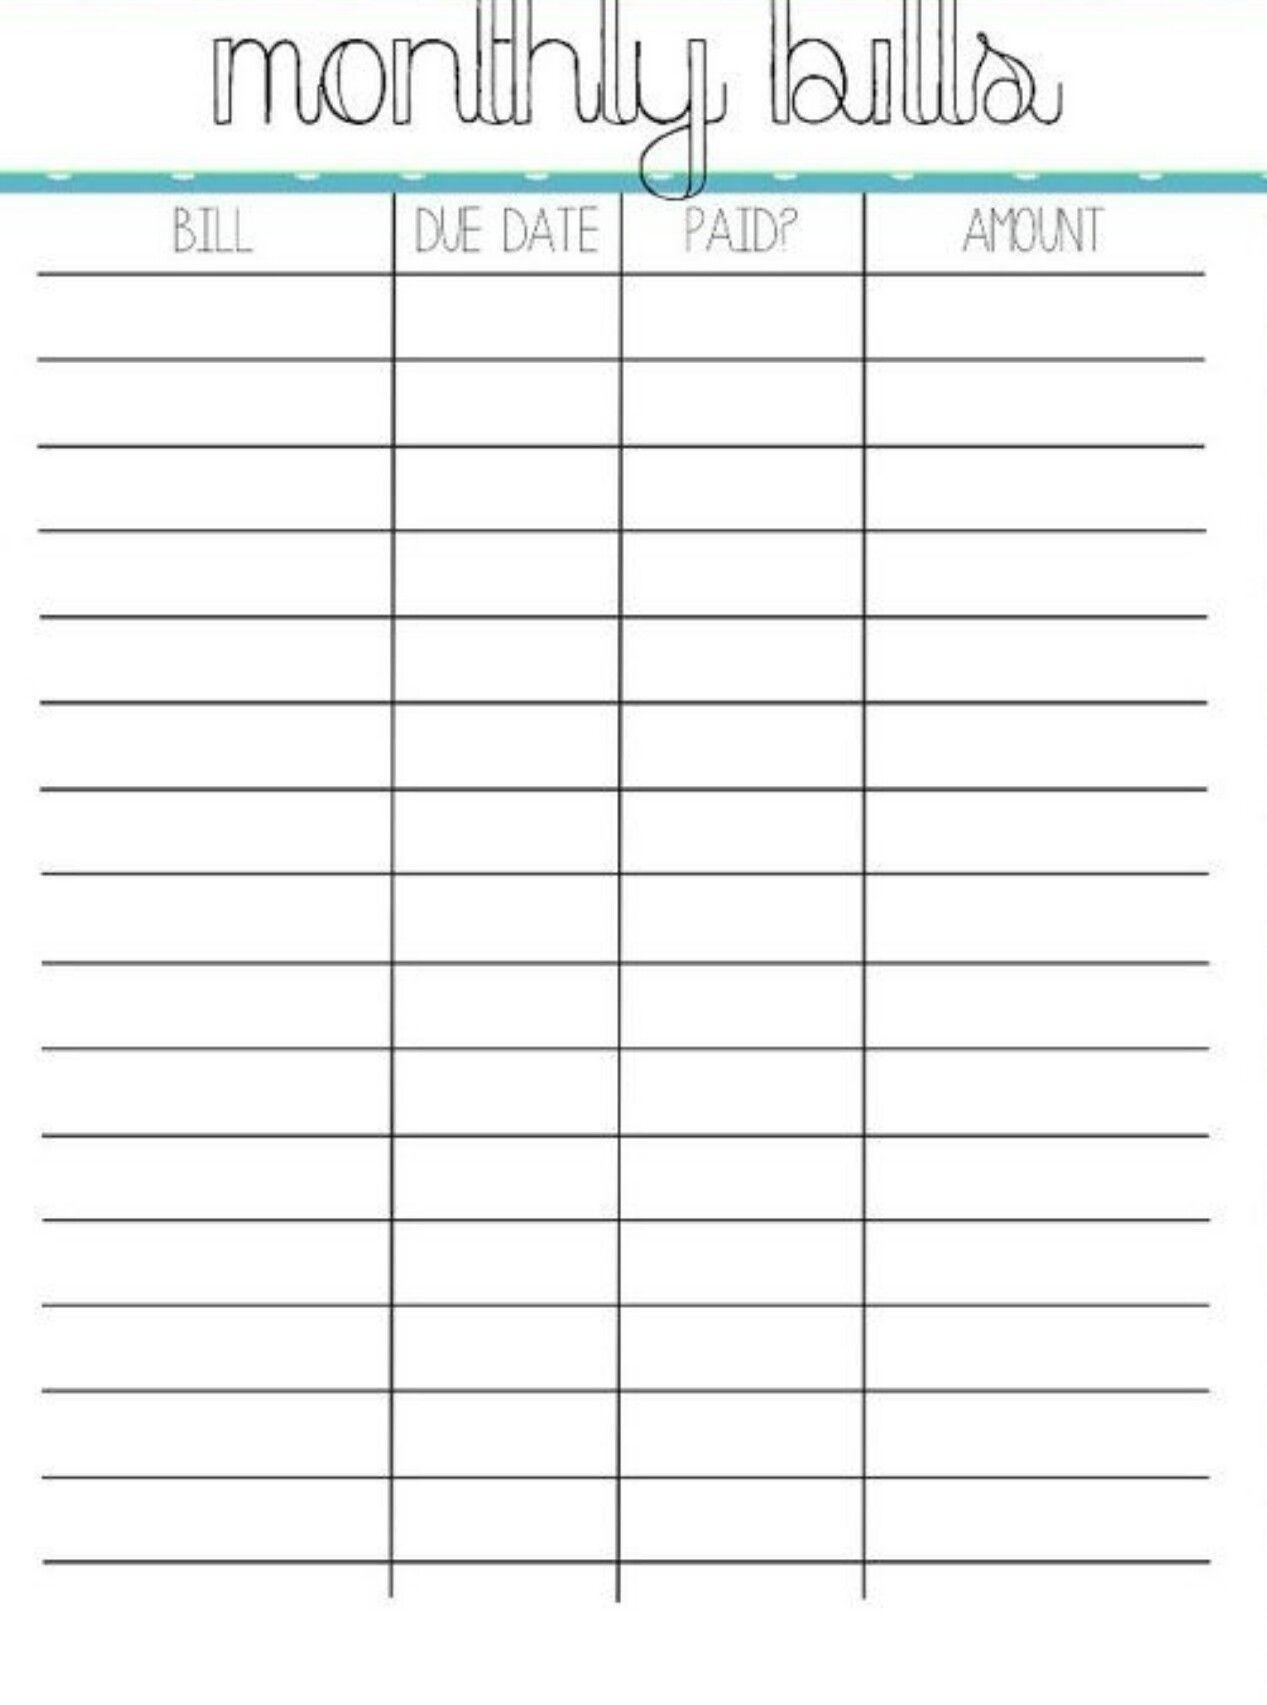 Pin By Crystal On Bills | Organizing Monthly Bills, Bill-Bill Planner Template Printable Calendar